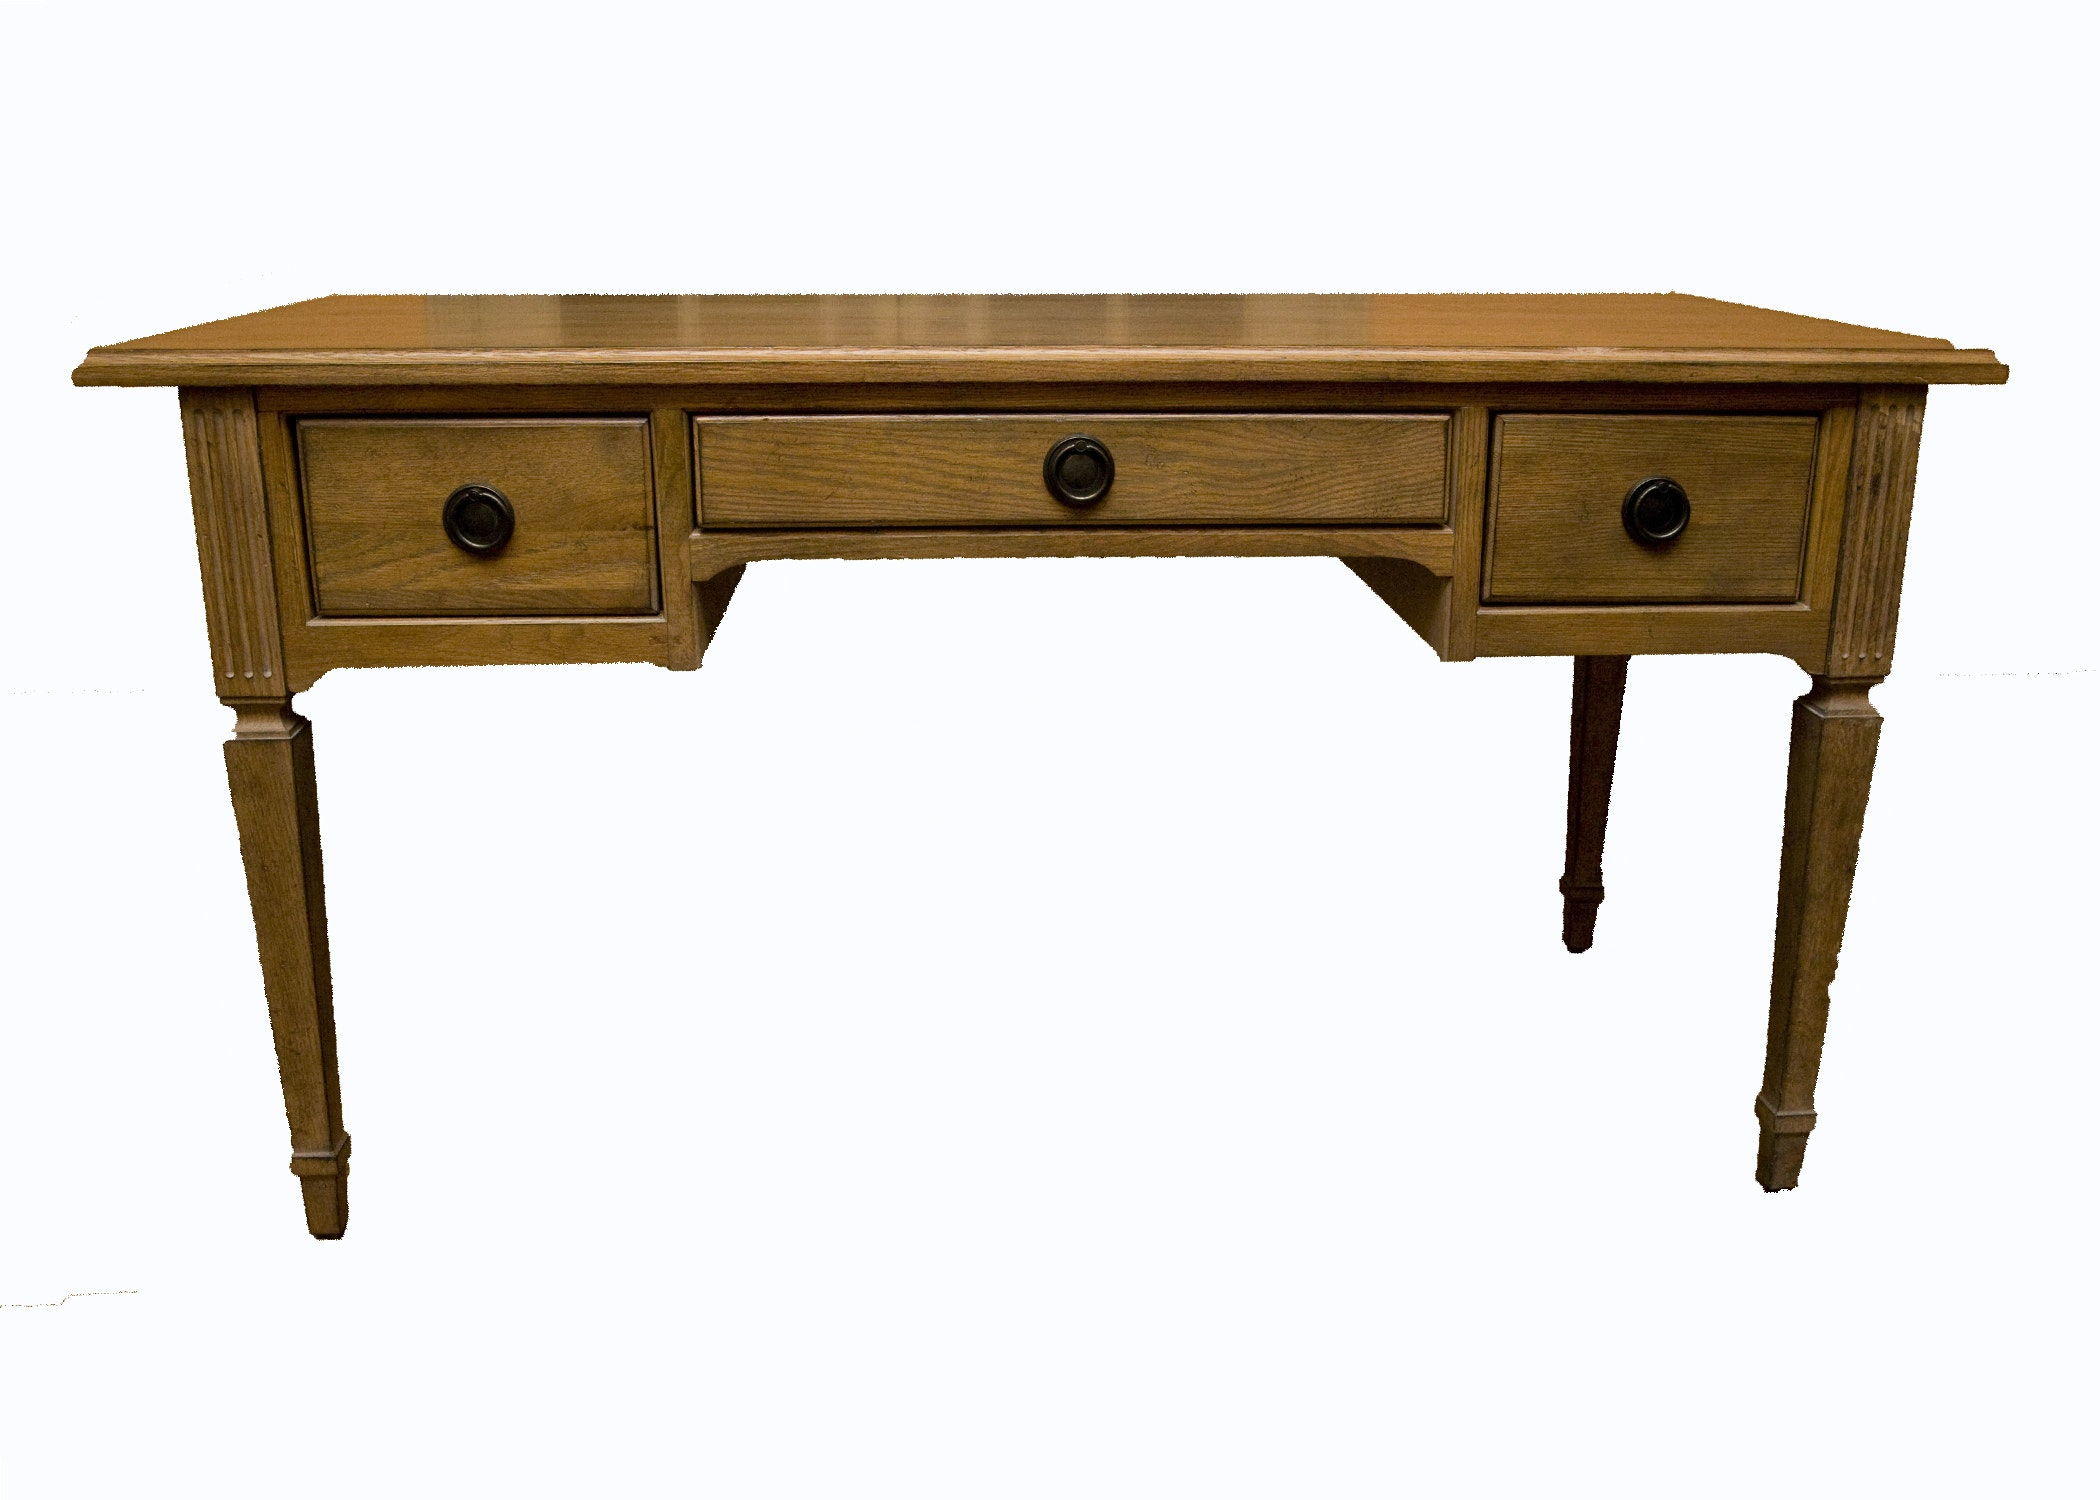 Model homes furniture auction houston tx